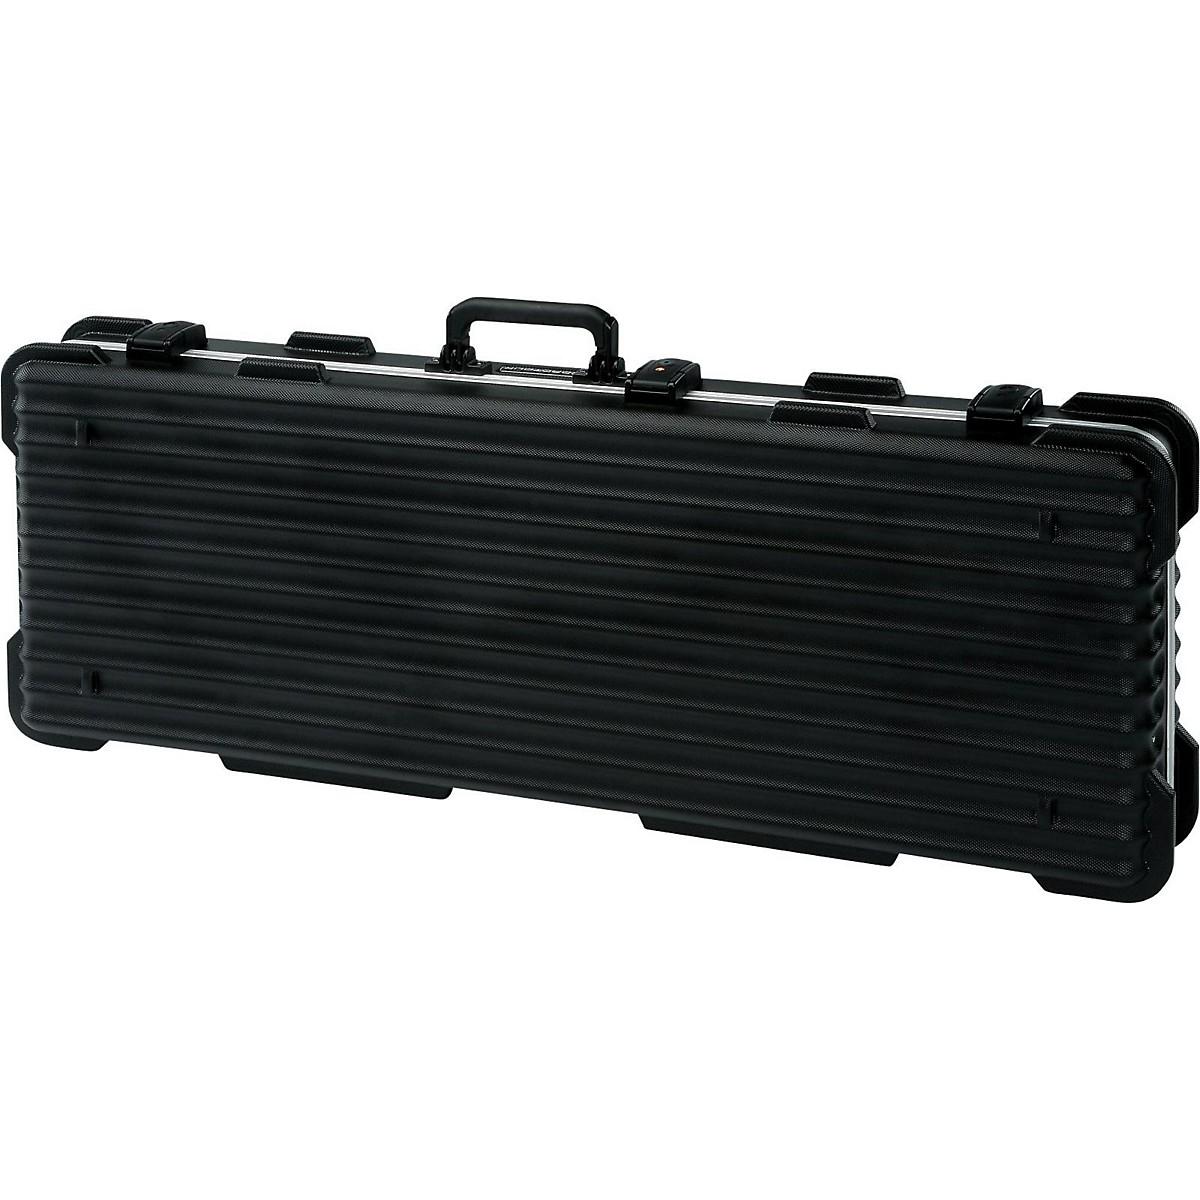 Ibanez MR500C Hardshell Guitar Case